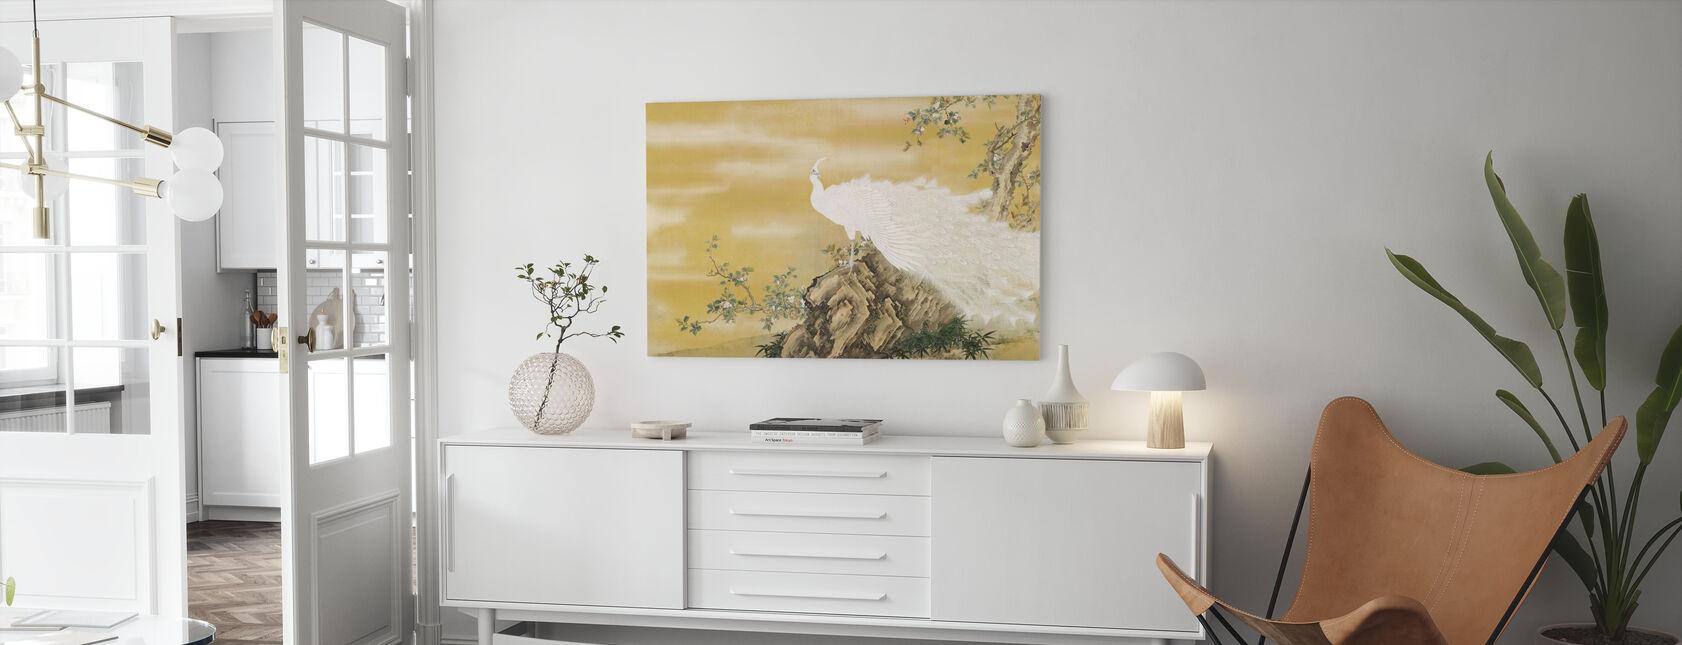 White Peafowl - Canvas print - Living Room